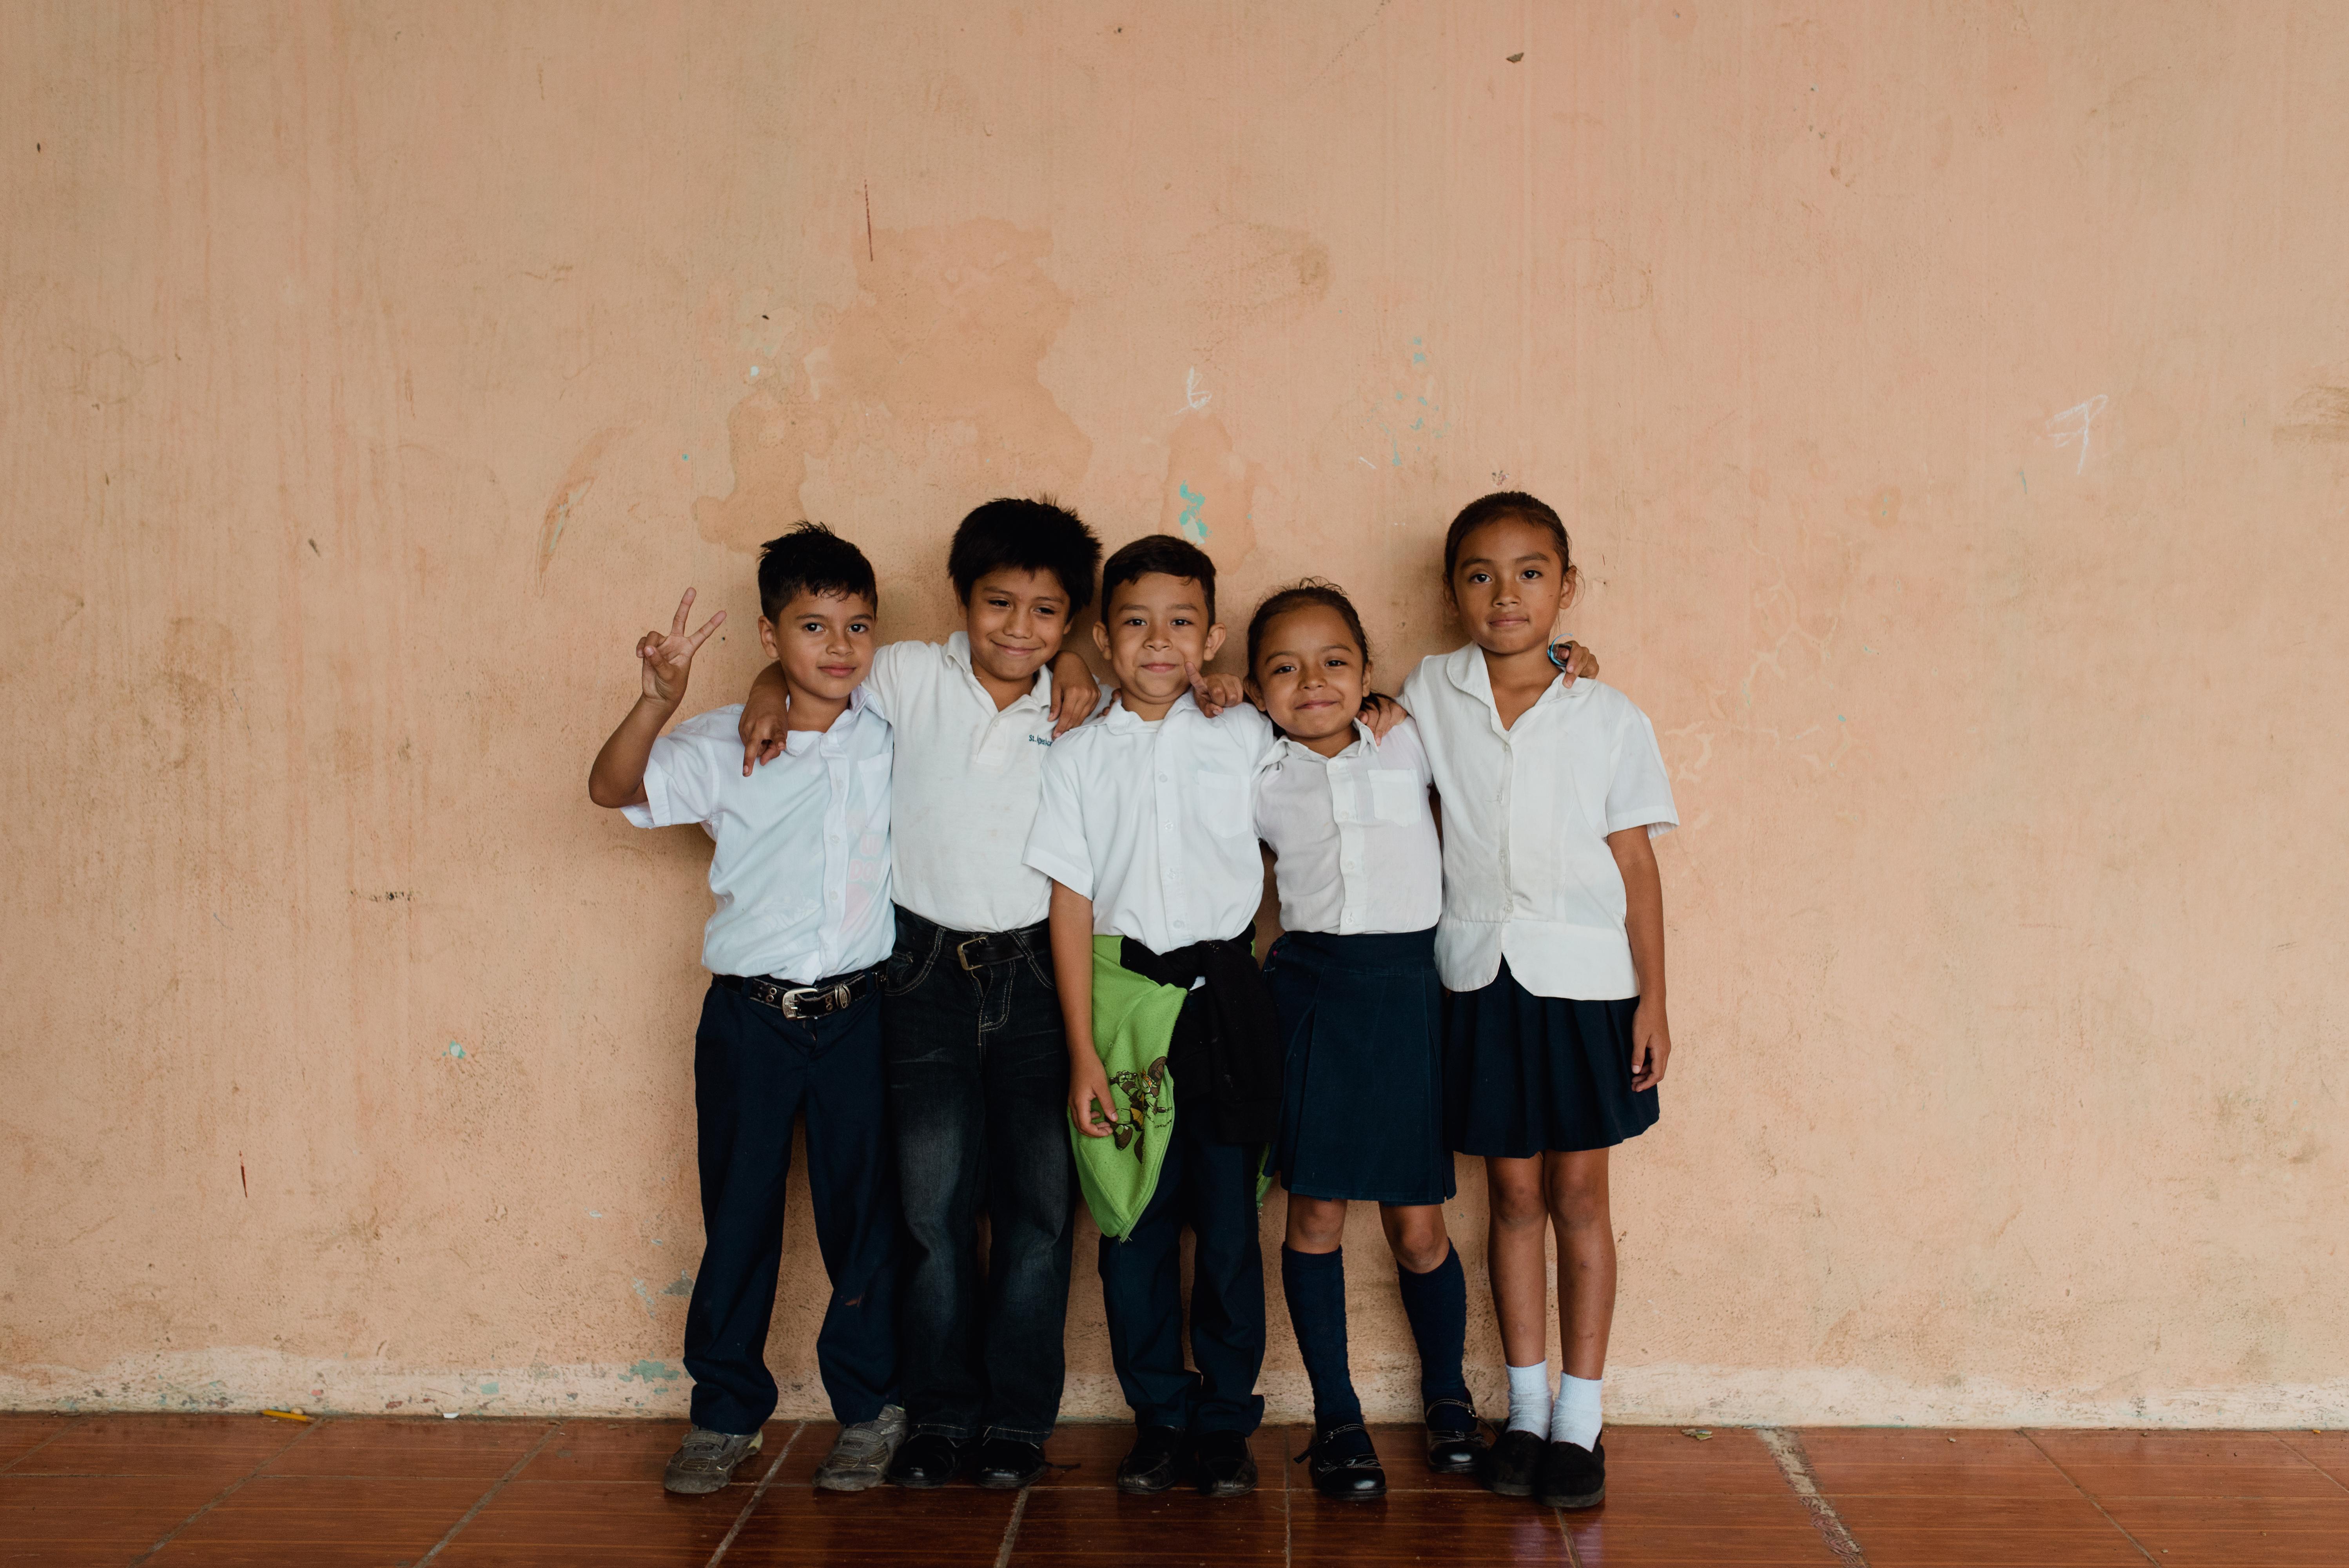 Fun with classmates!